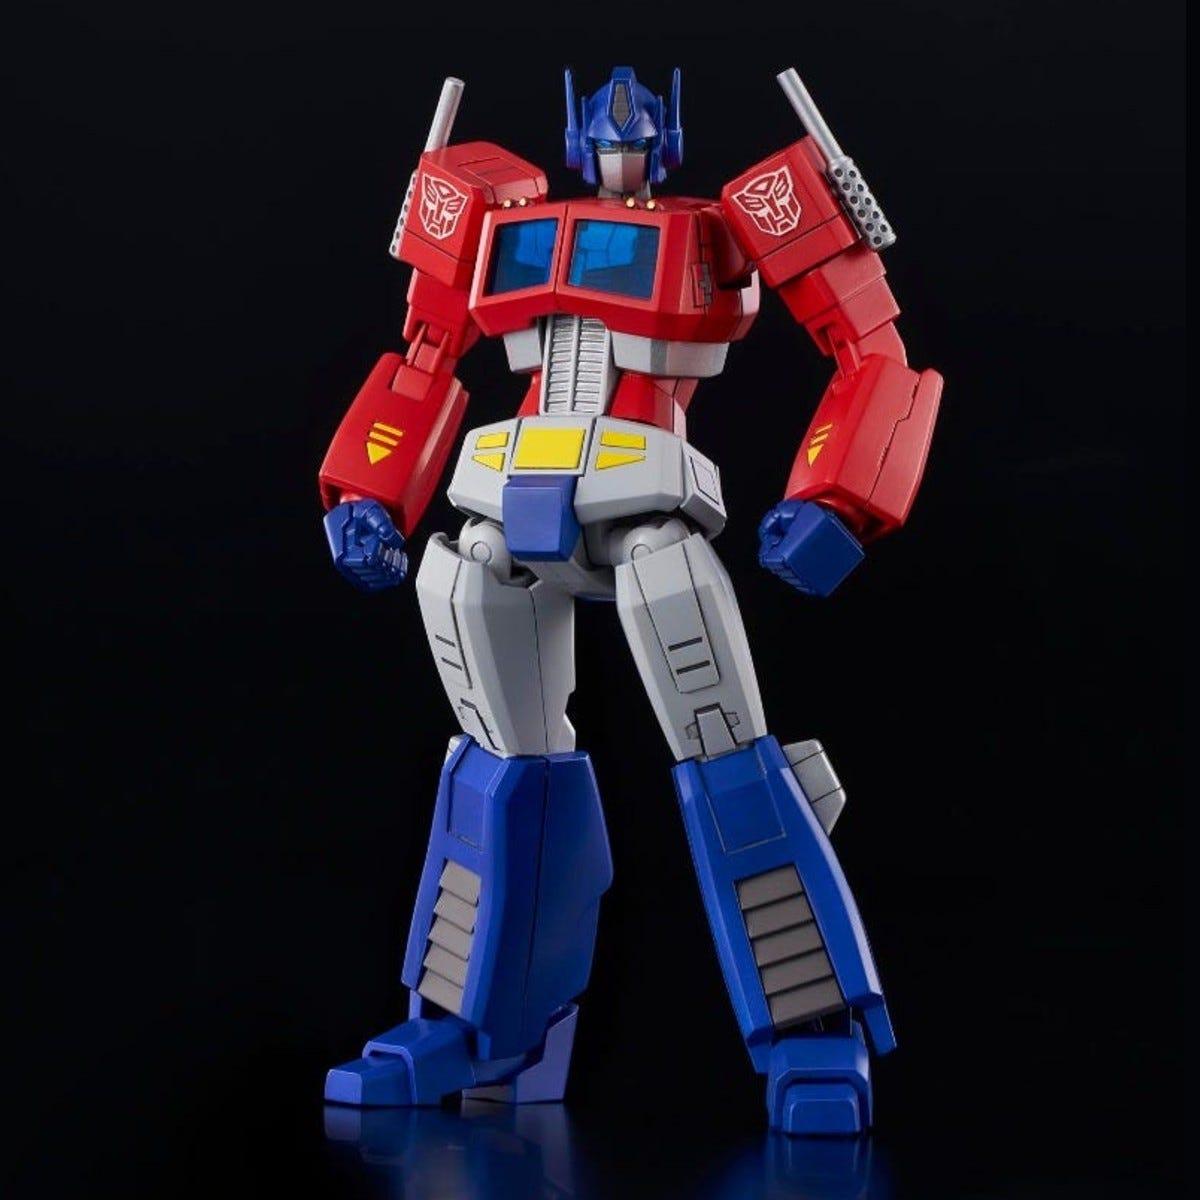 "Flame Toys Furai Model ""Transformers"" Optimus Prime (G1 Ver.)"